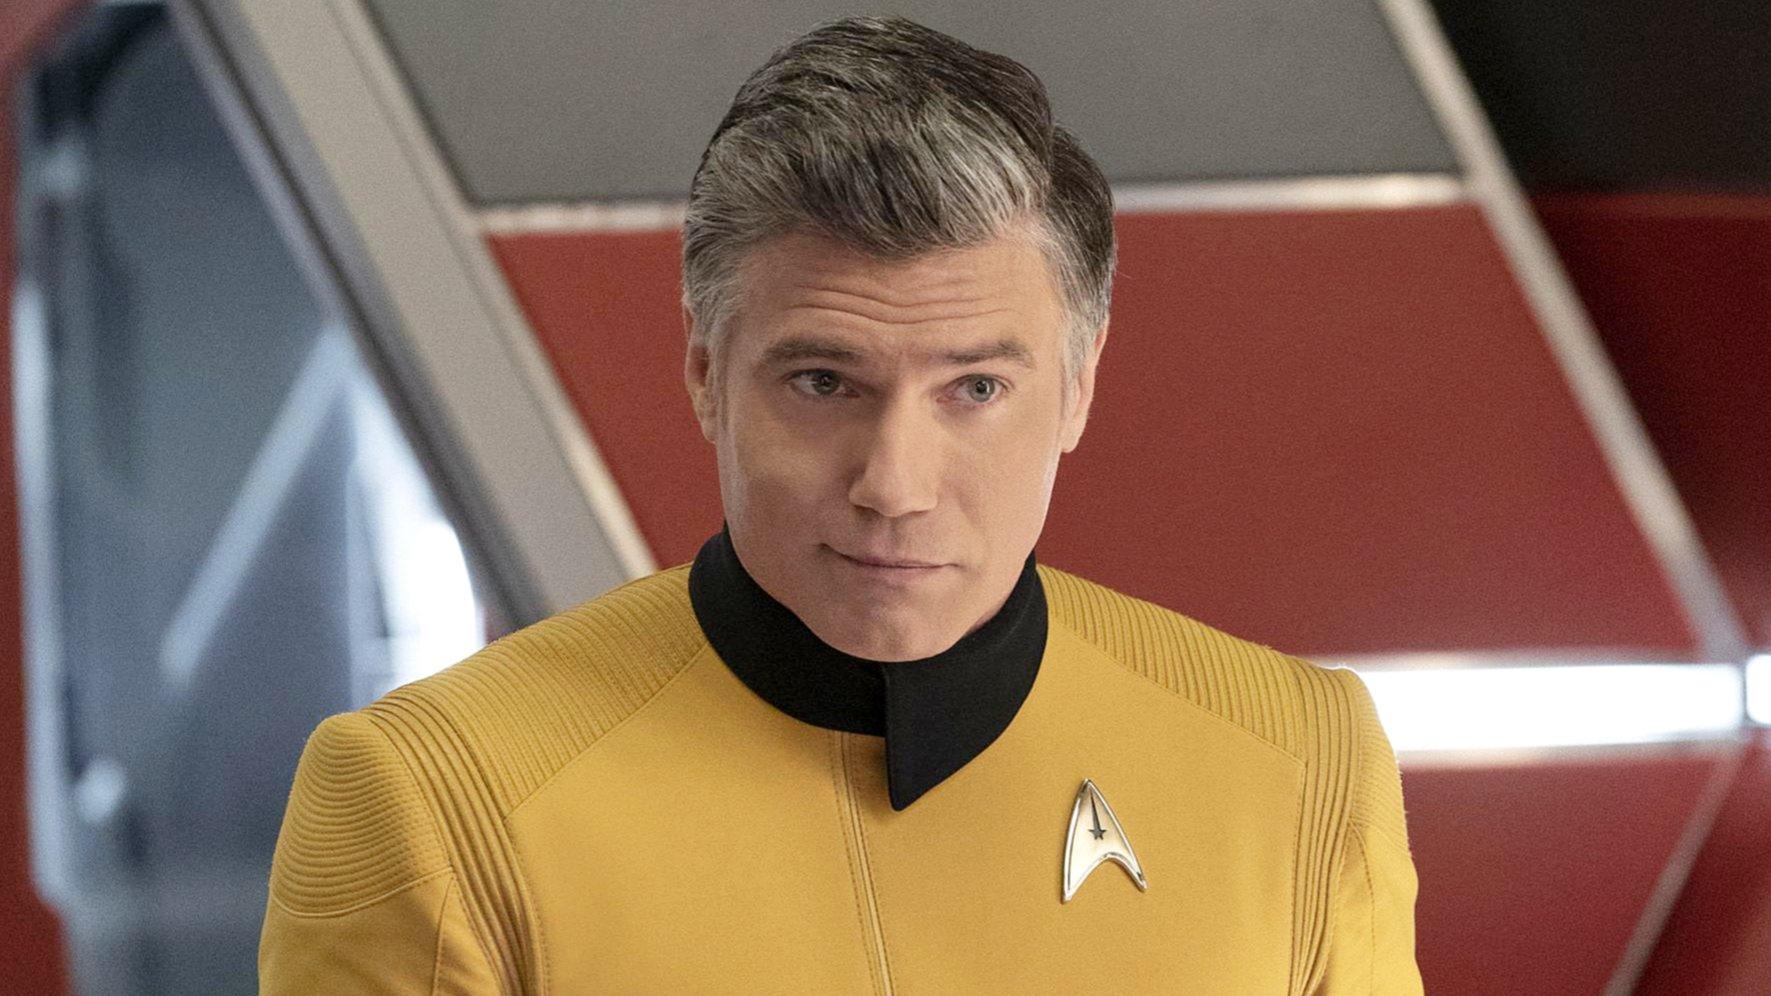 Star Trek's Anson Mount Attacks Guardians Of The Galaxy Director, Napoleon Complex?